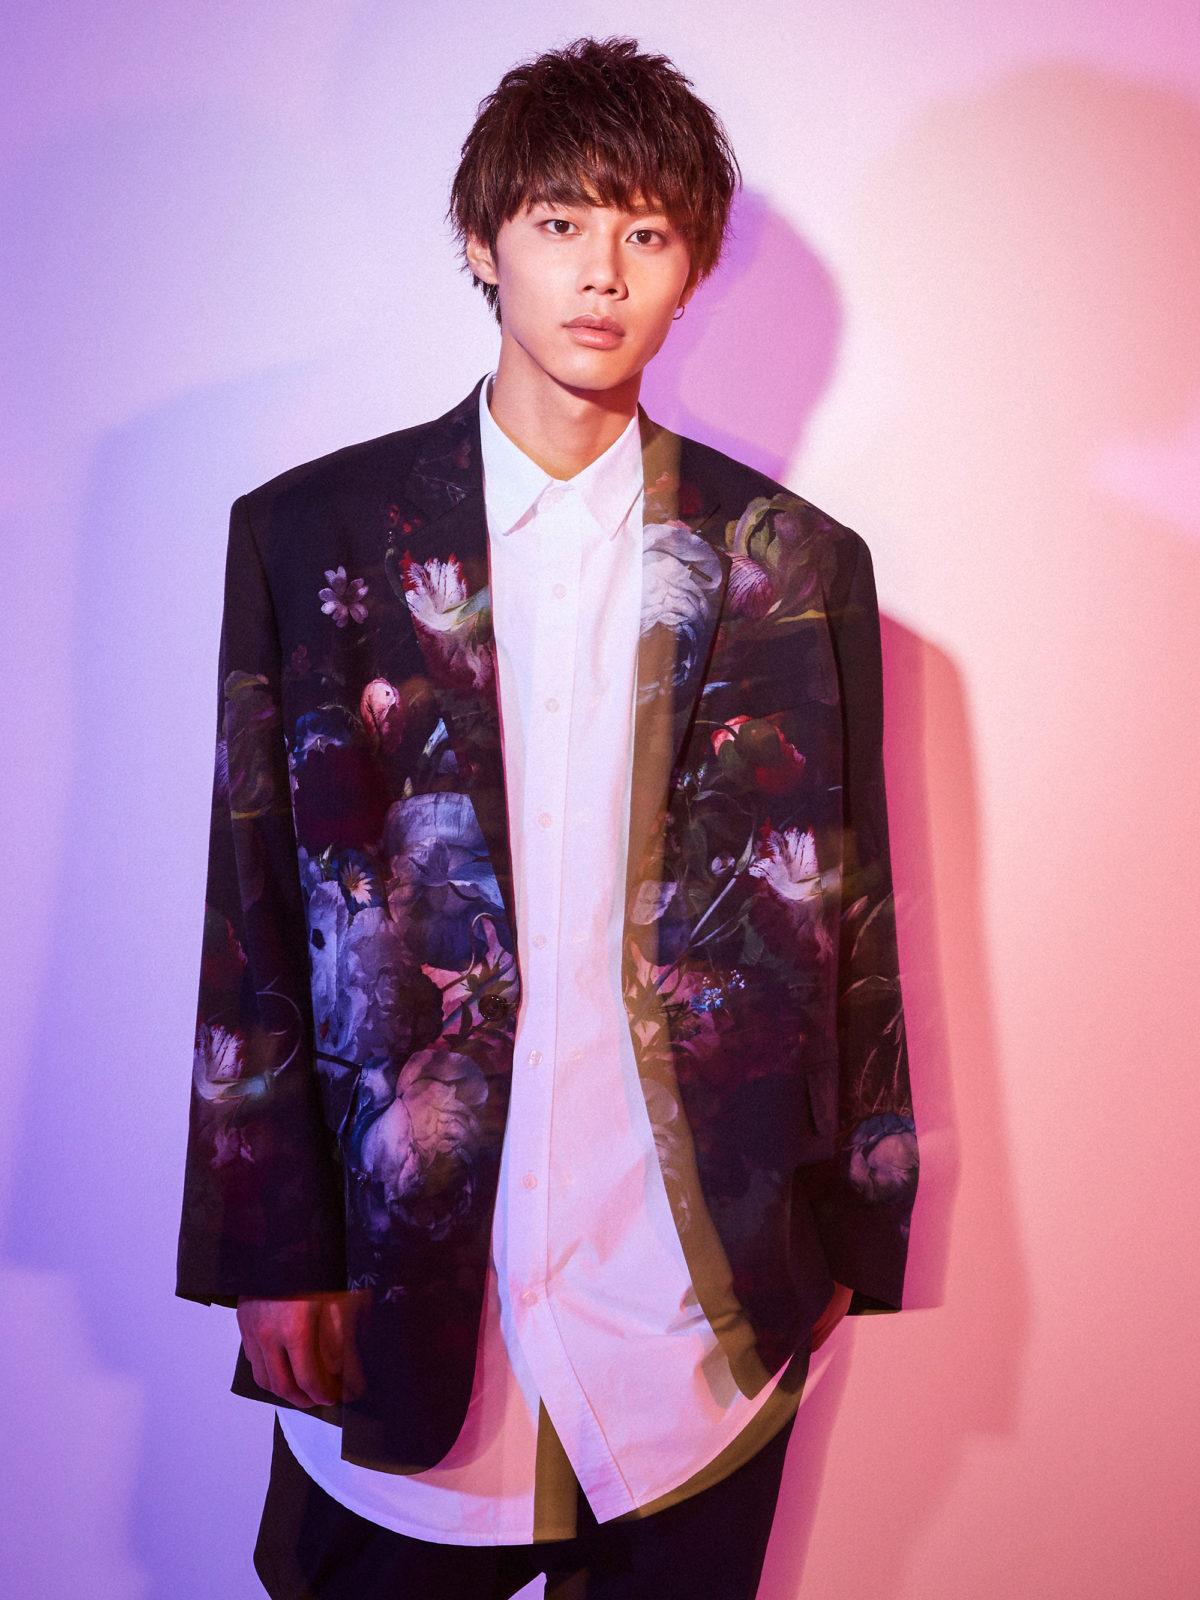 SOLIDEMO 手島章斗、ソロ初デジタルリリース楽曲「大好き。」ジャケット写真解禁サムネイル画像